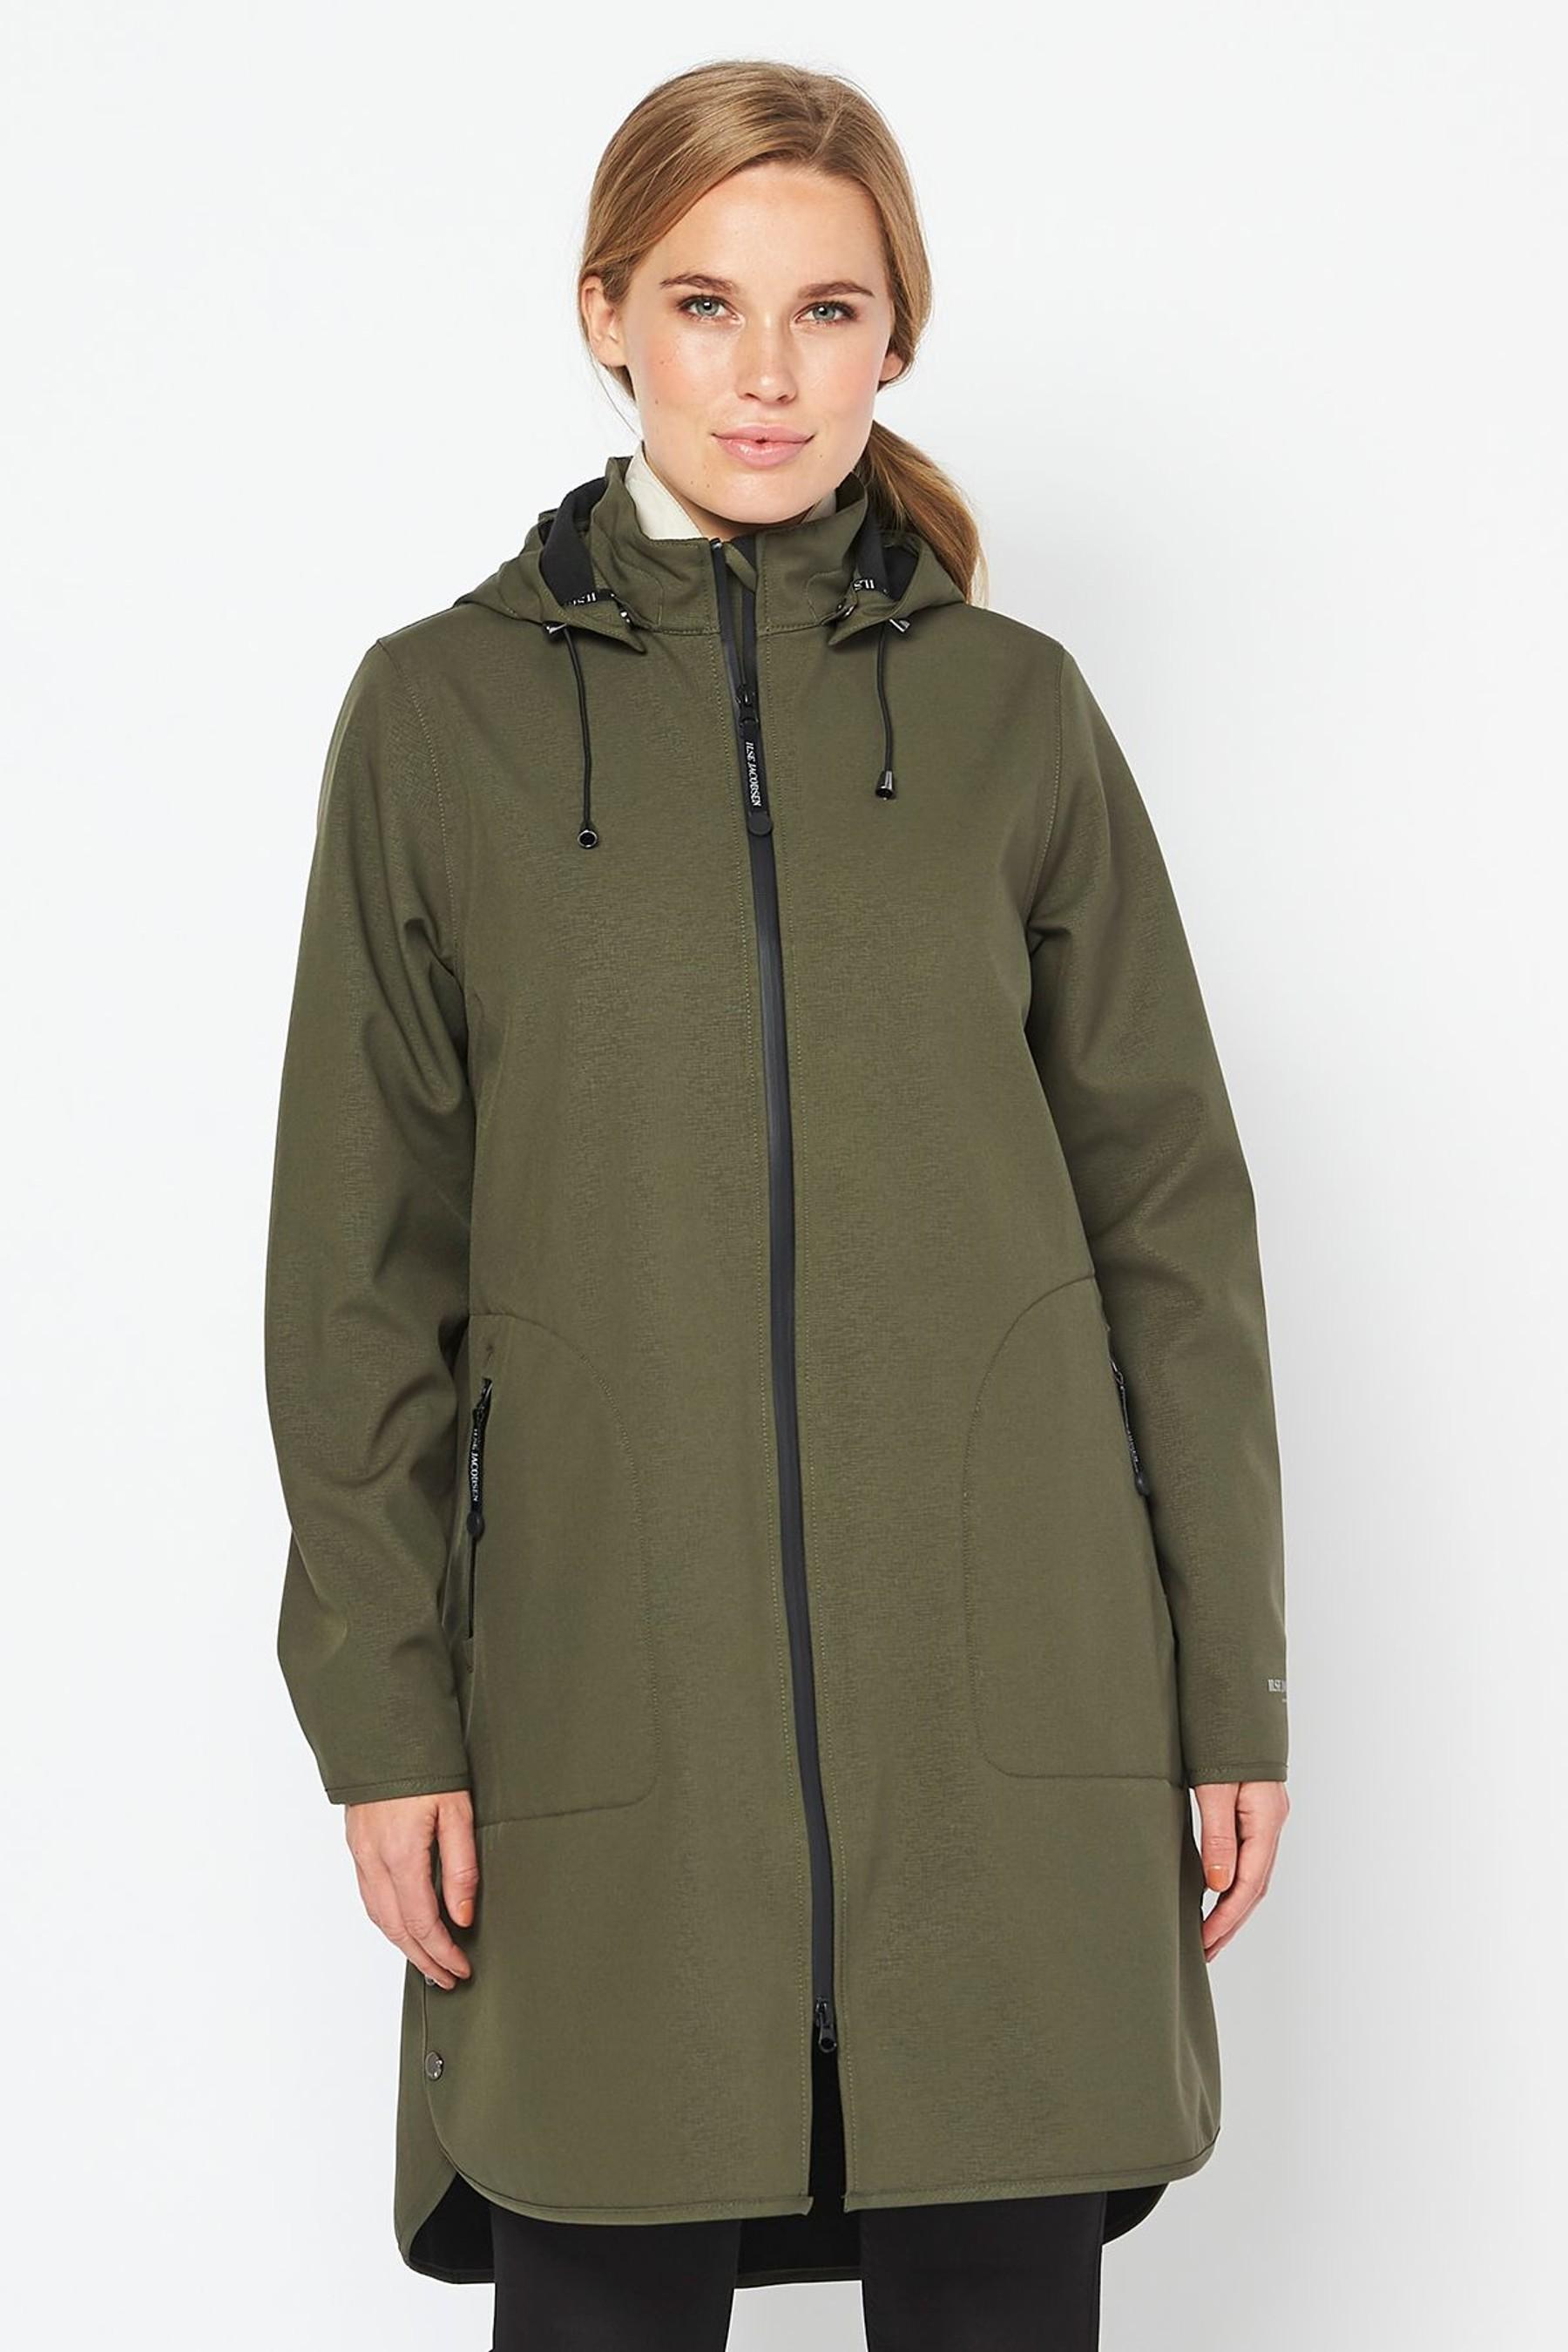 Green Raincoat   by Ilse Jacobsen £225